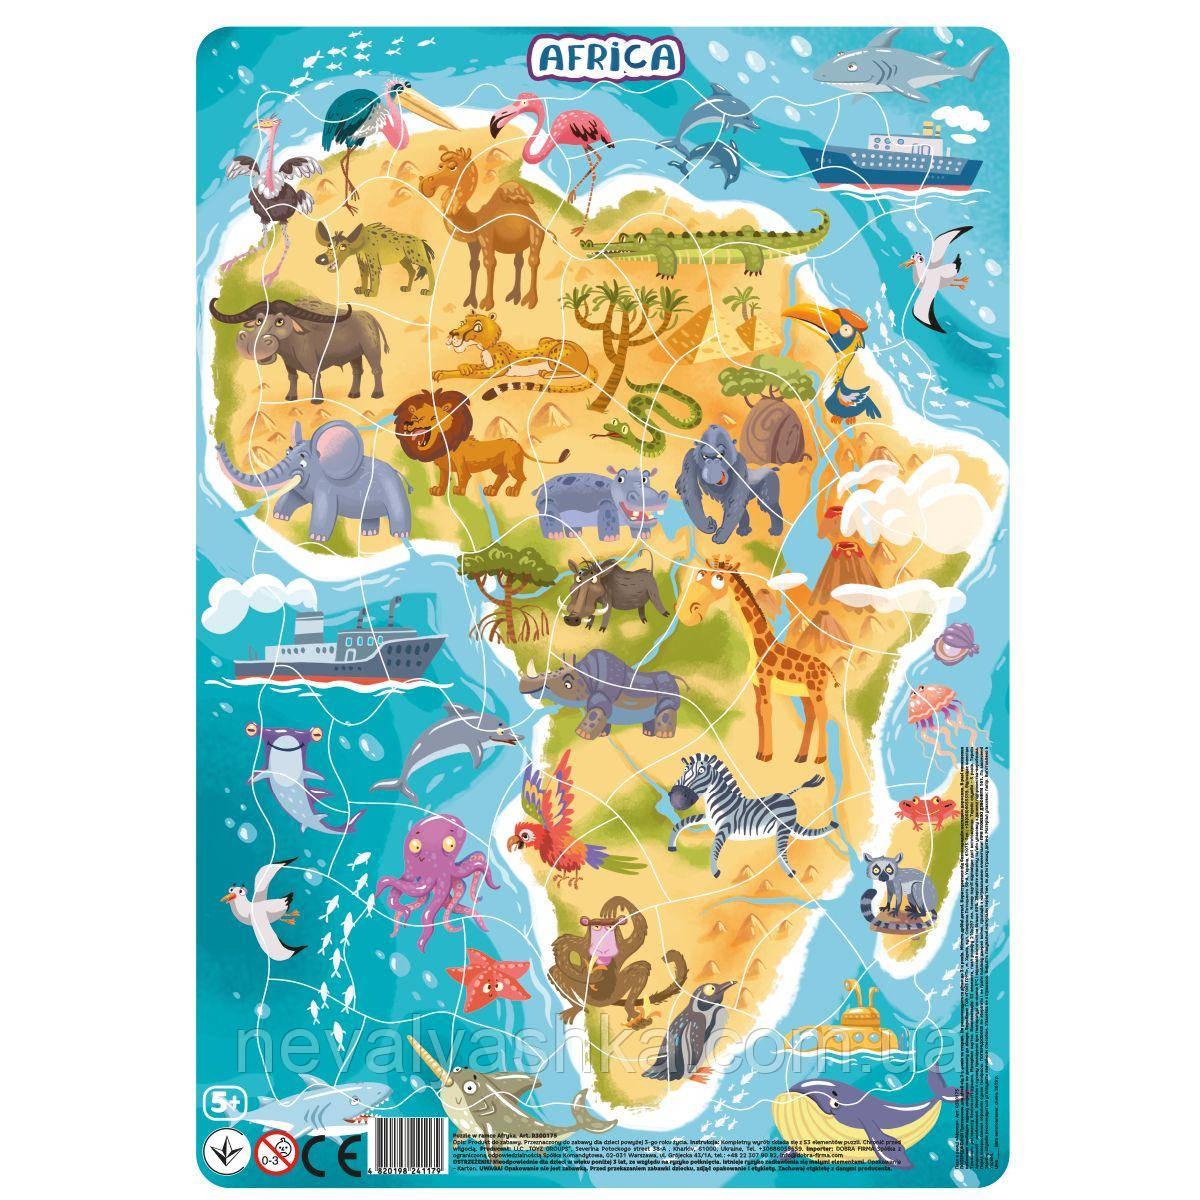 Пазл з Рамкою Африка 30 см Пазл з рамкою 53 ел Пазли в Рамці Додо DoDo 300175 011274